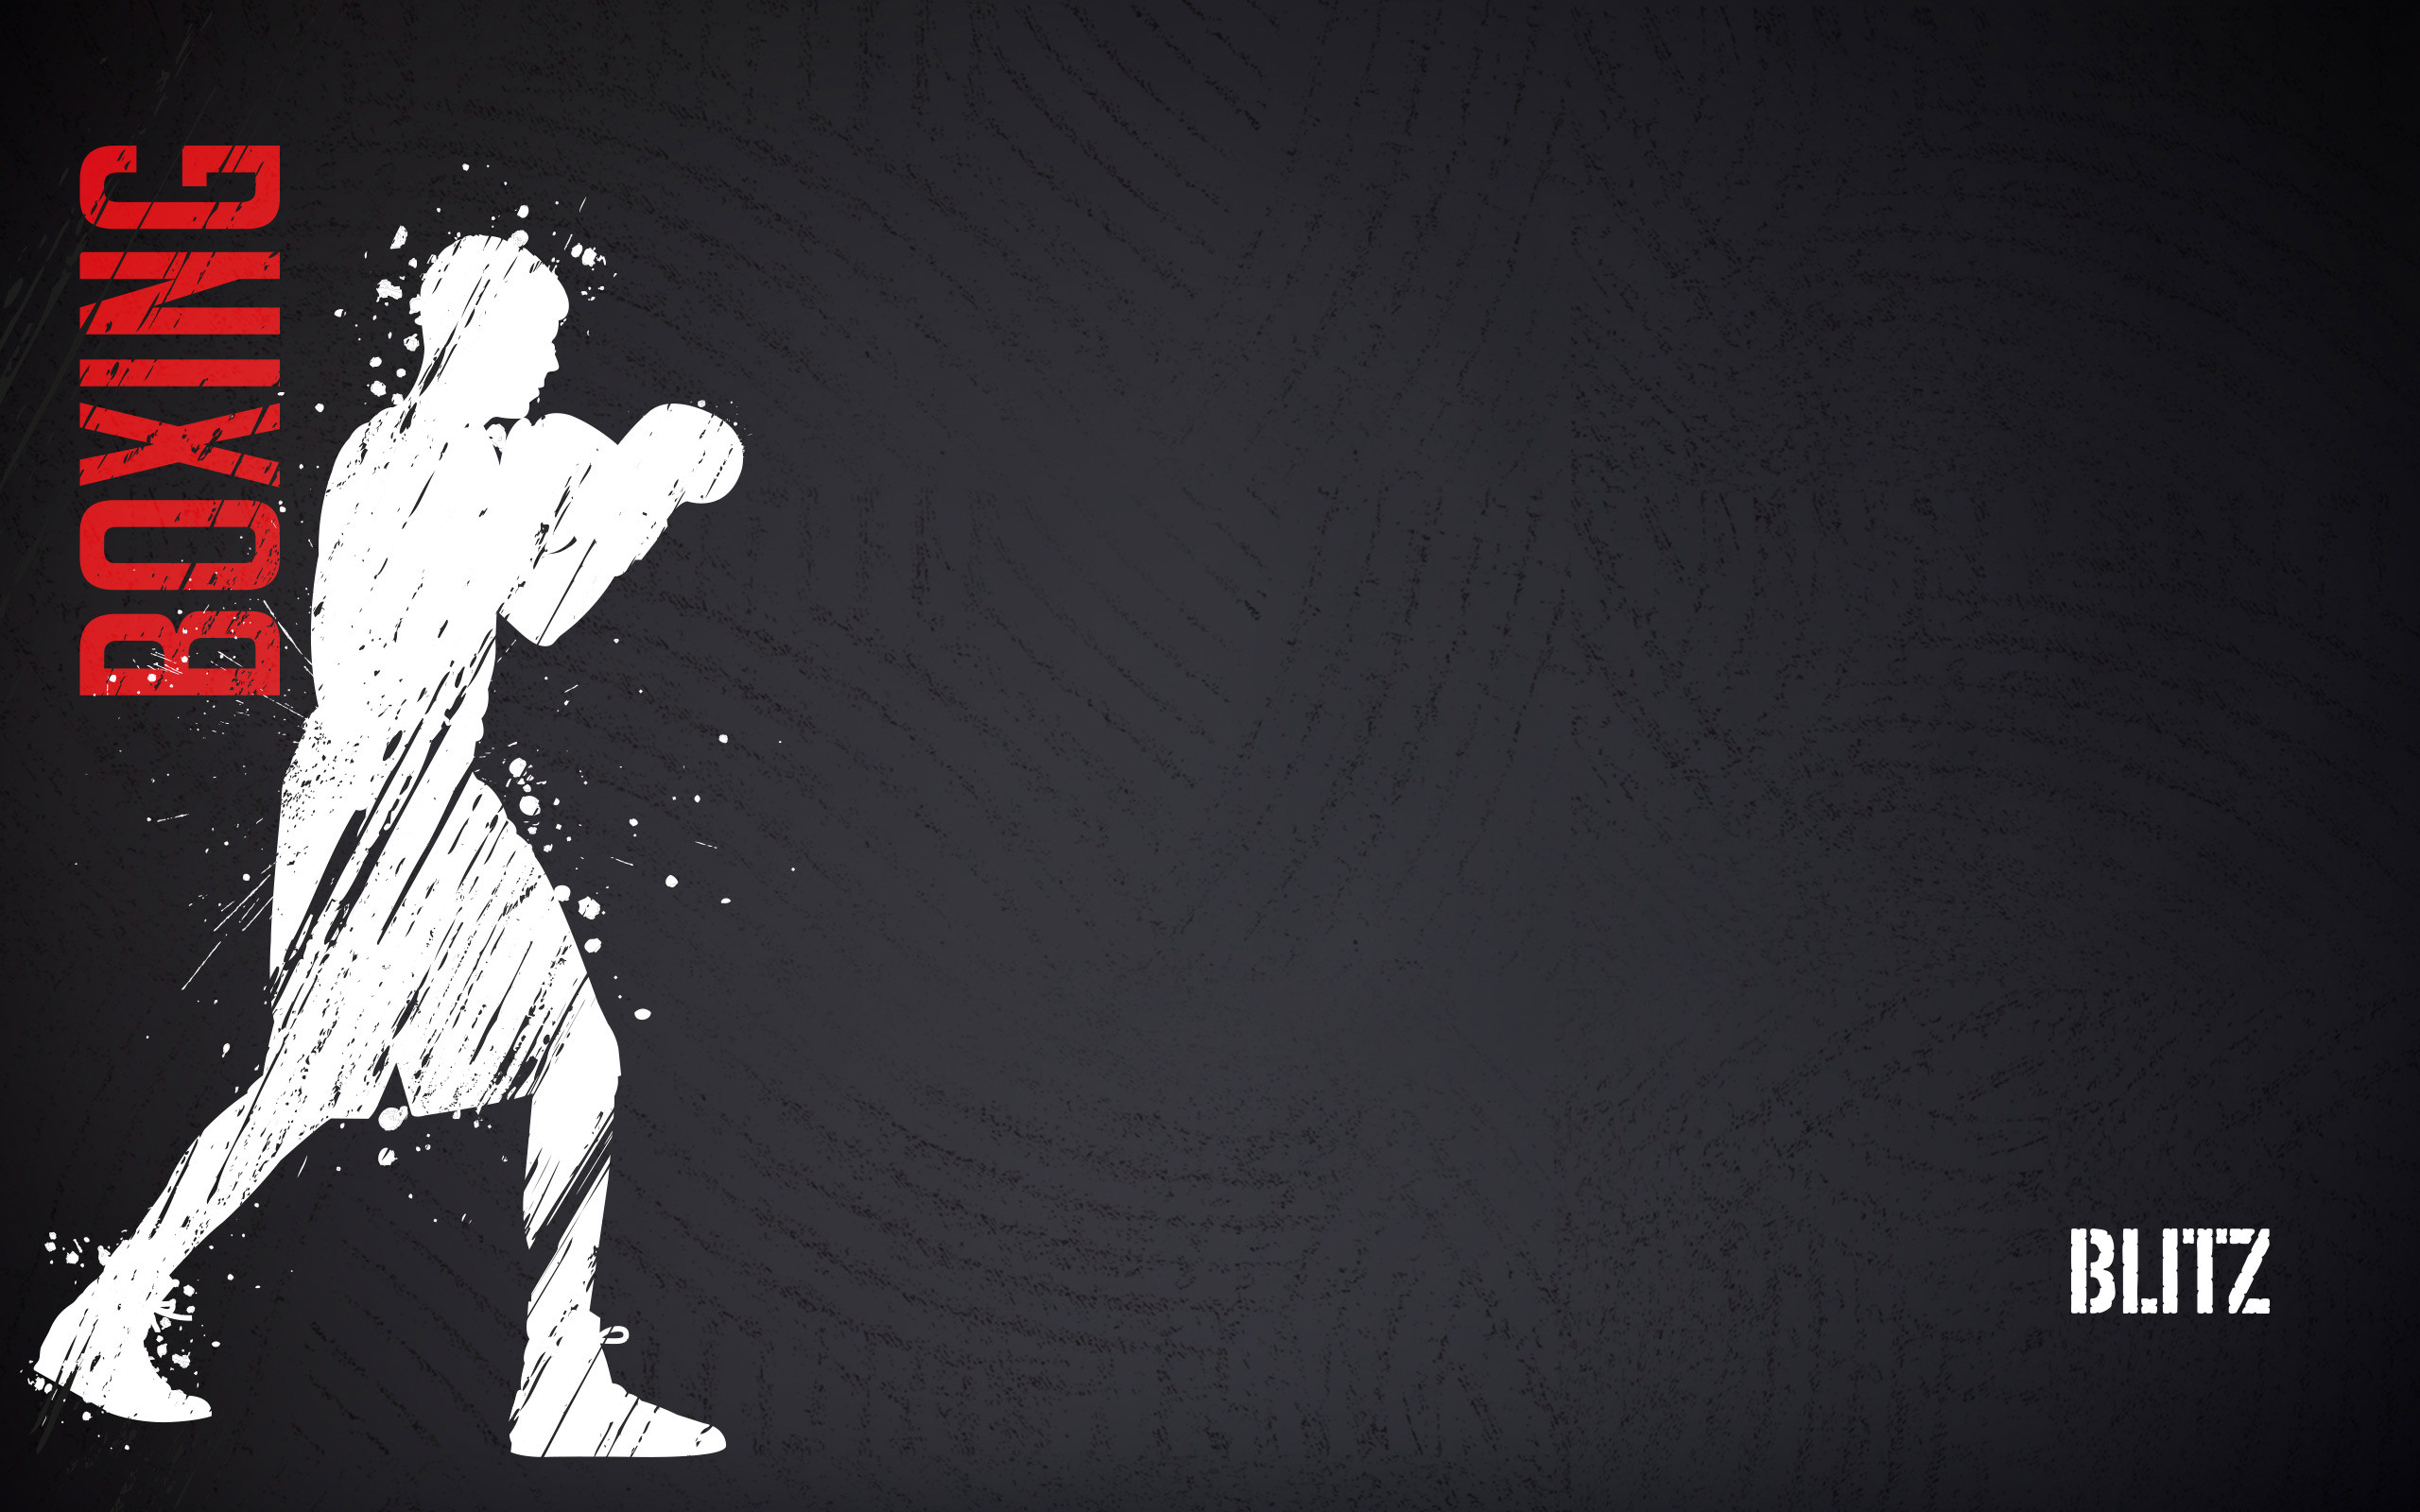 wallpaper.wiki-Blitz-Sport-Boxing-Black-Wallpaper-2560-